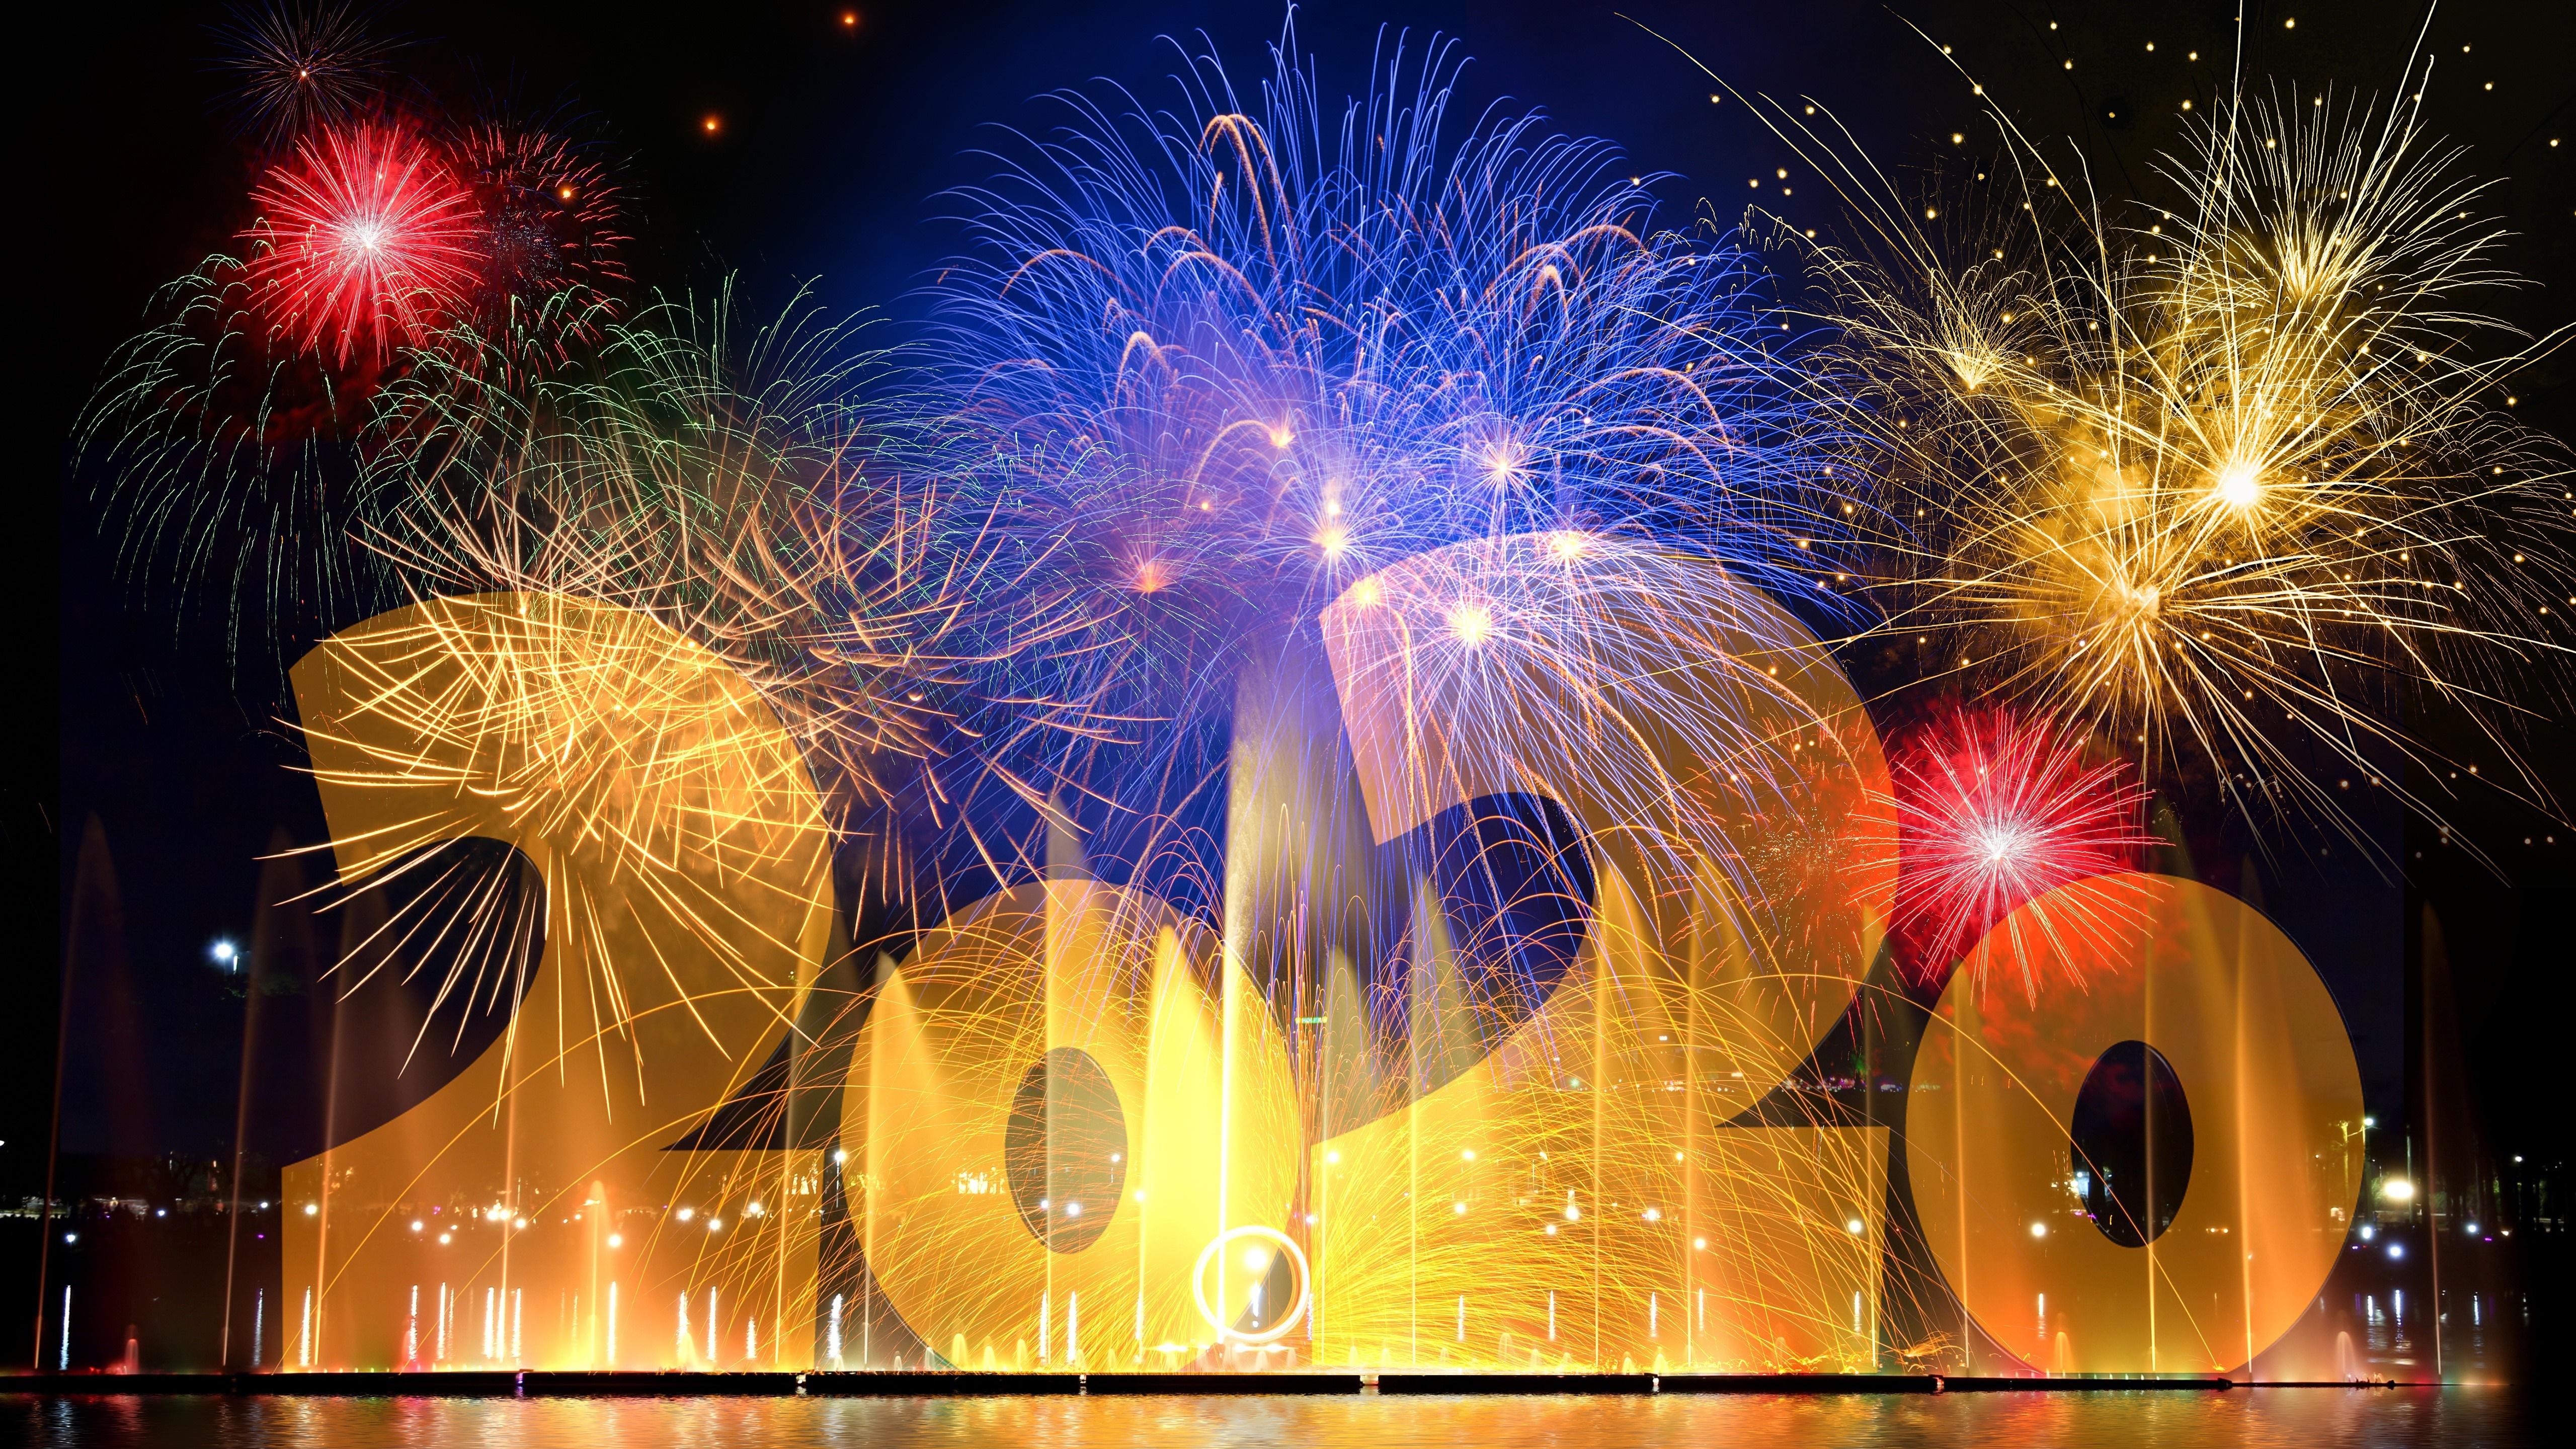 2020 New Year fireworks wallpaper